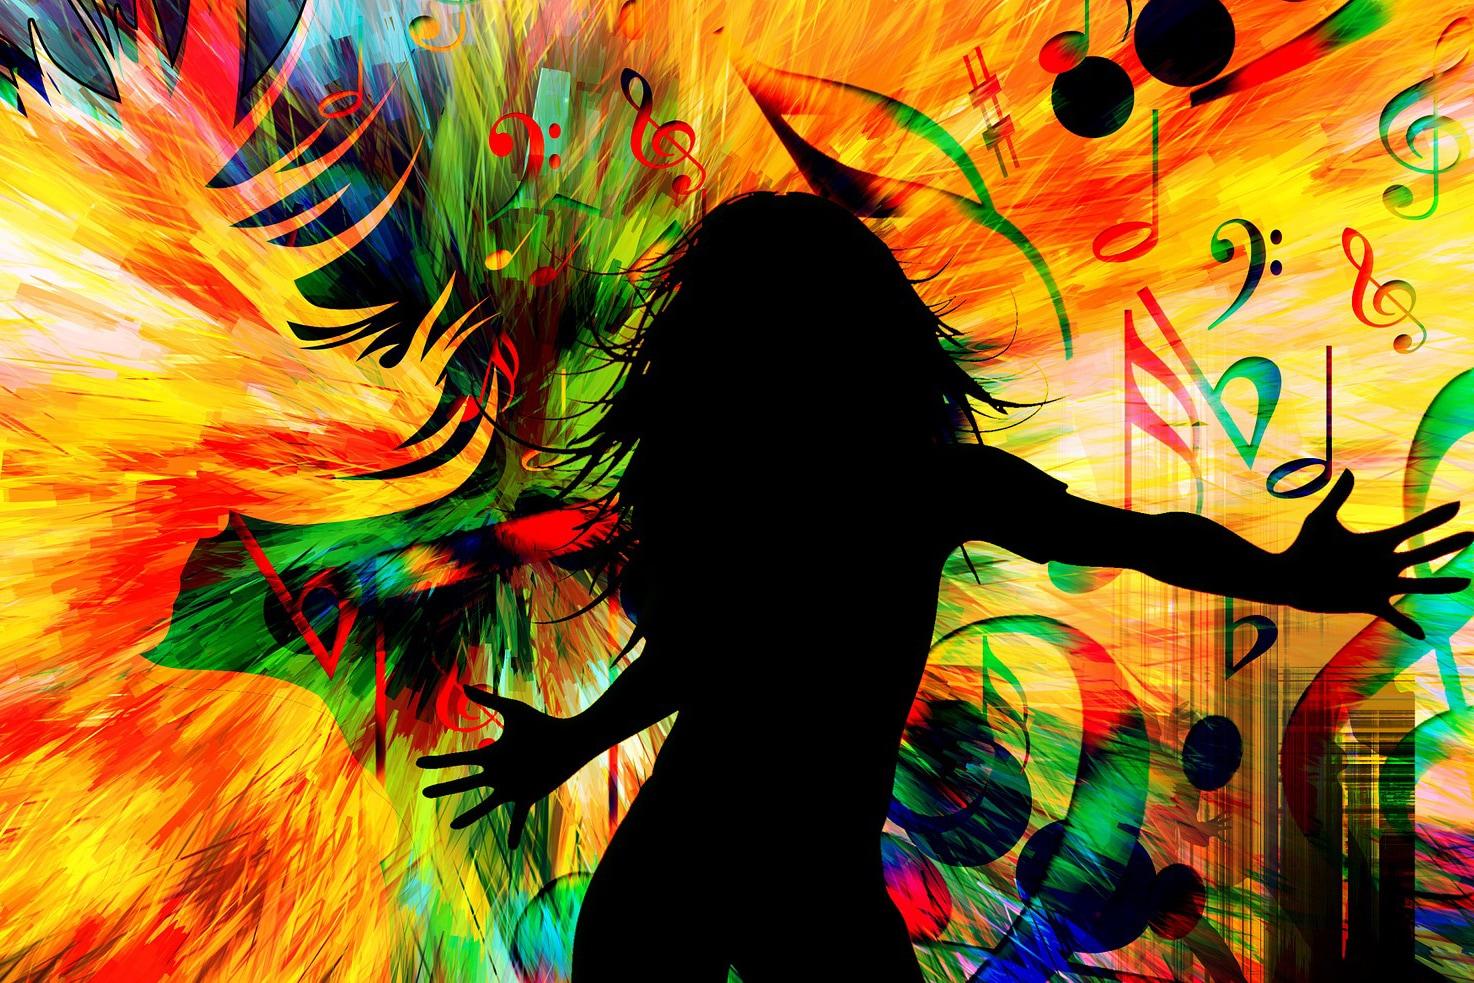 jugendkulturjahr-2020-ratingen-jkj2020-tanzprojekt-zeitreise